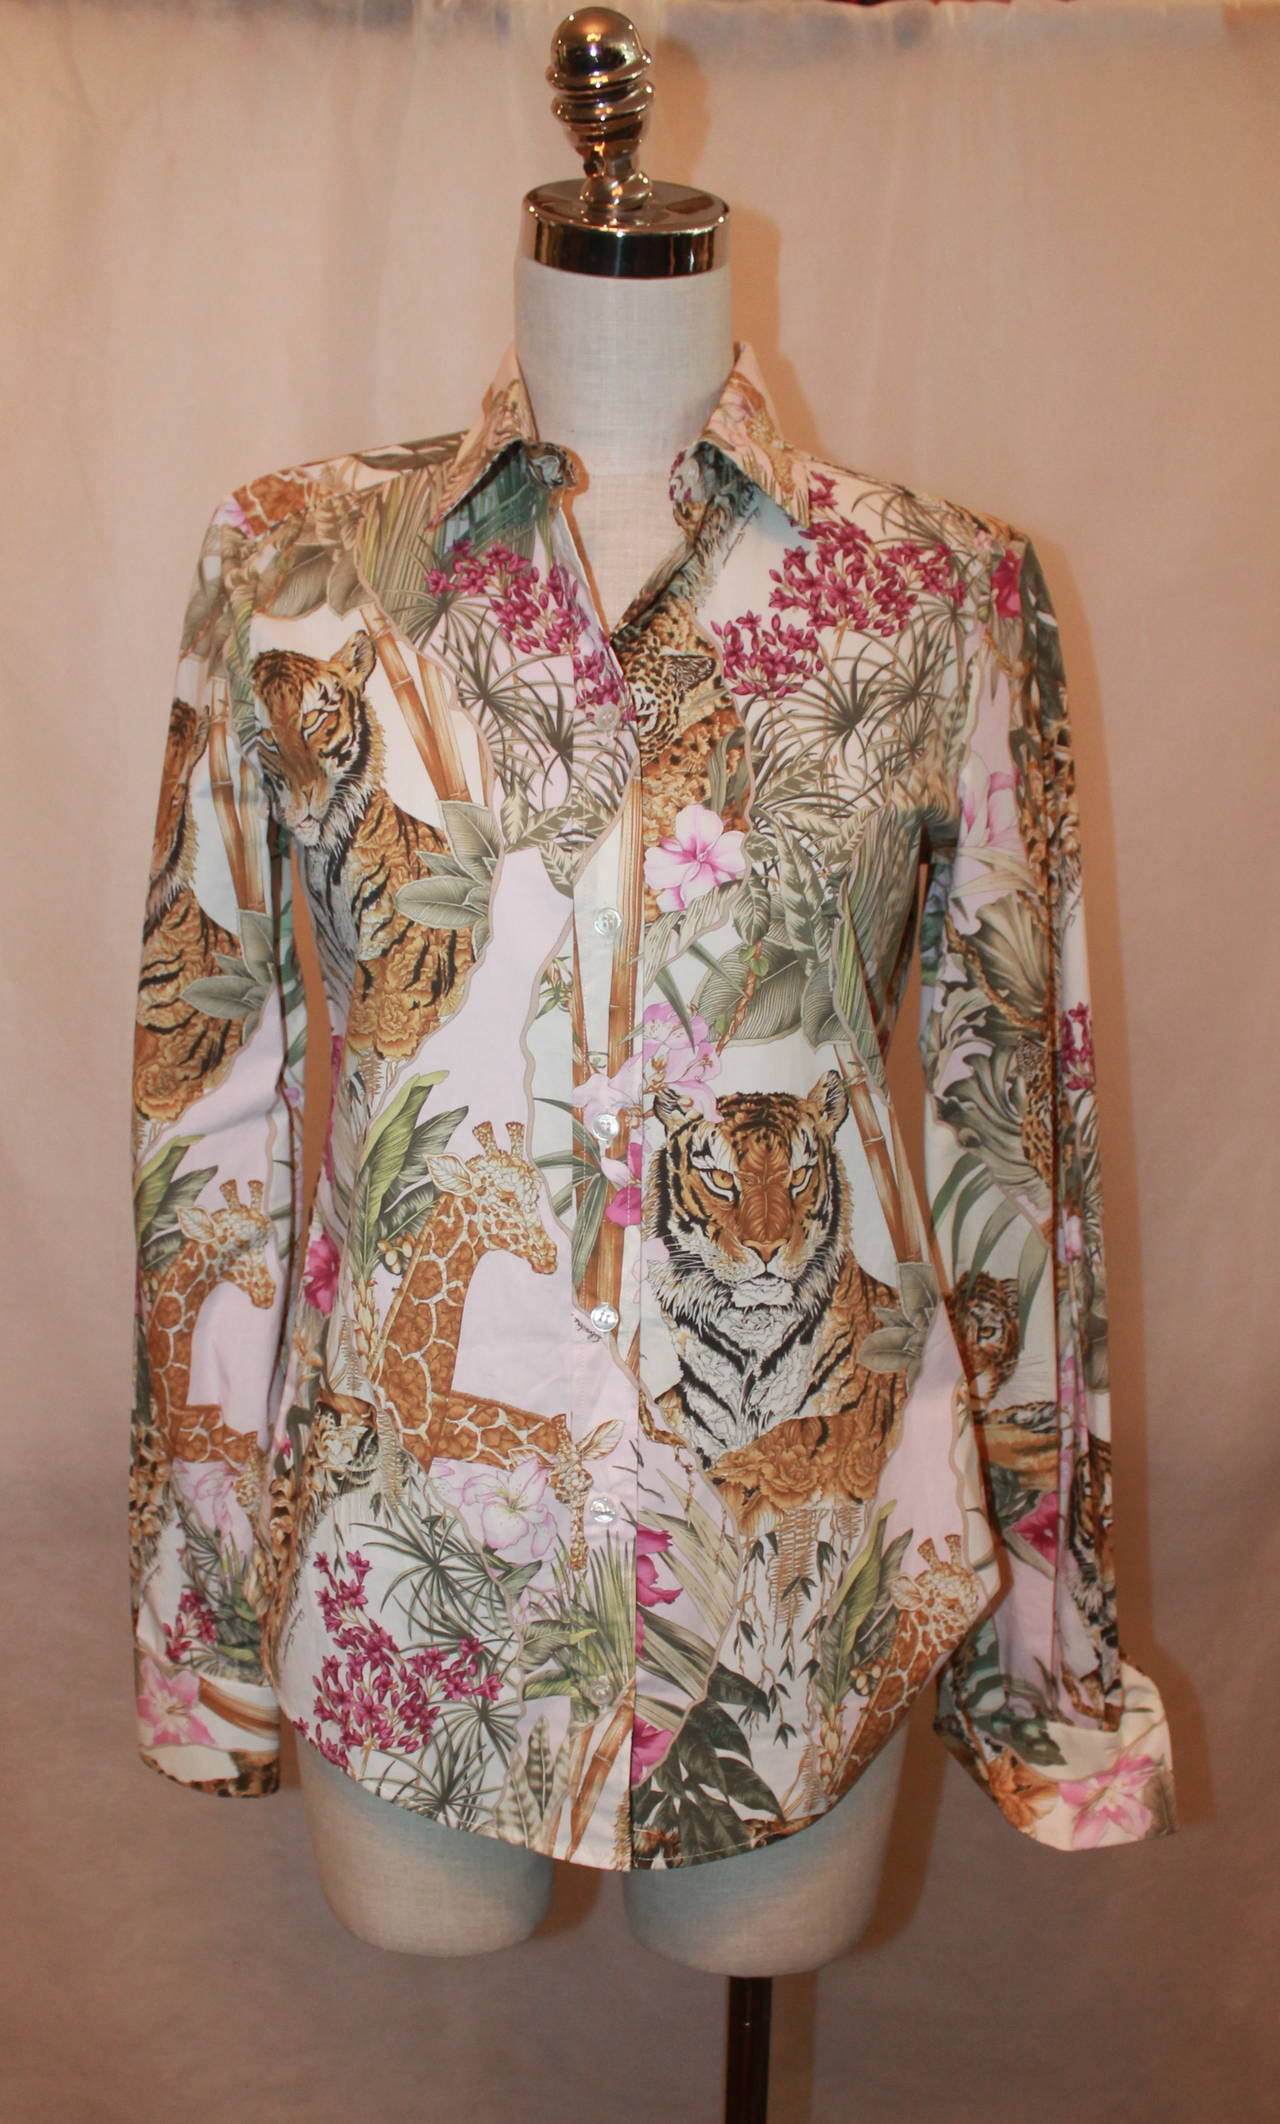 Salvatore Ferragamo Multi Color Jungle Print Long Sleeve Shirt - 40 2